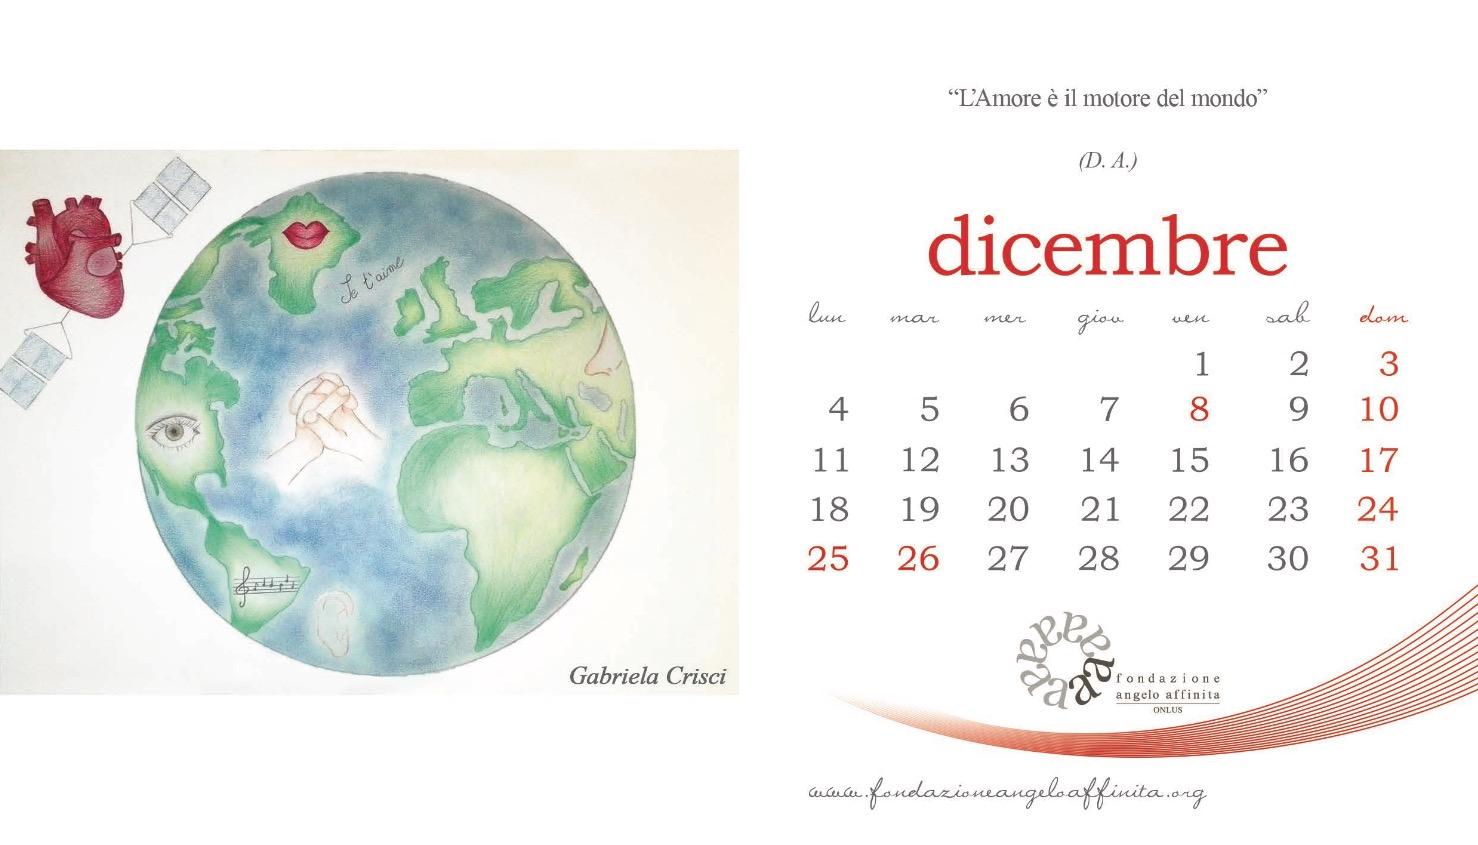 calendario-2017-fondazione-angelo-affinita_13